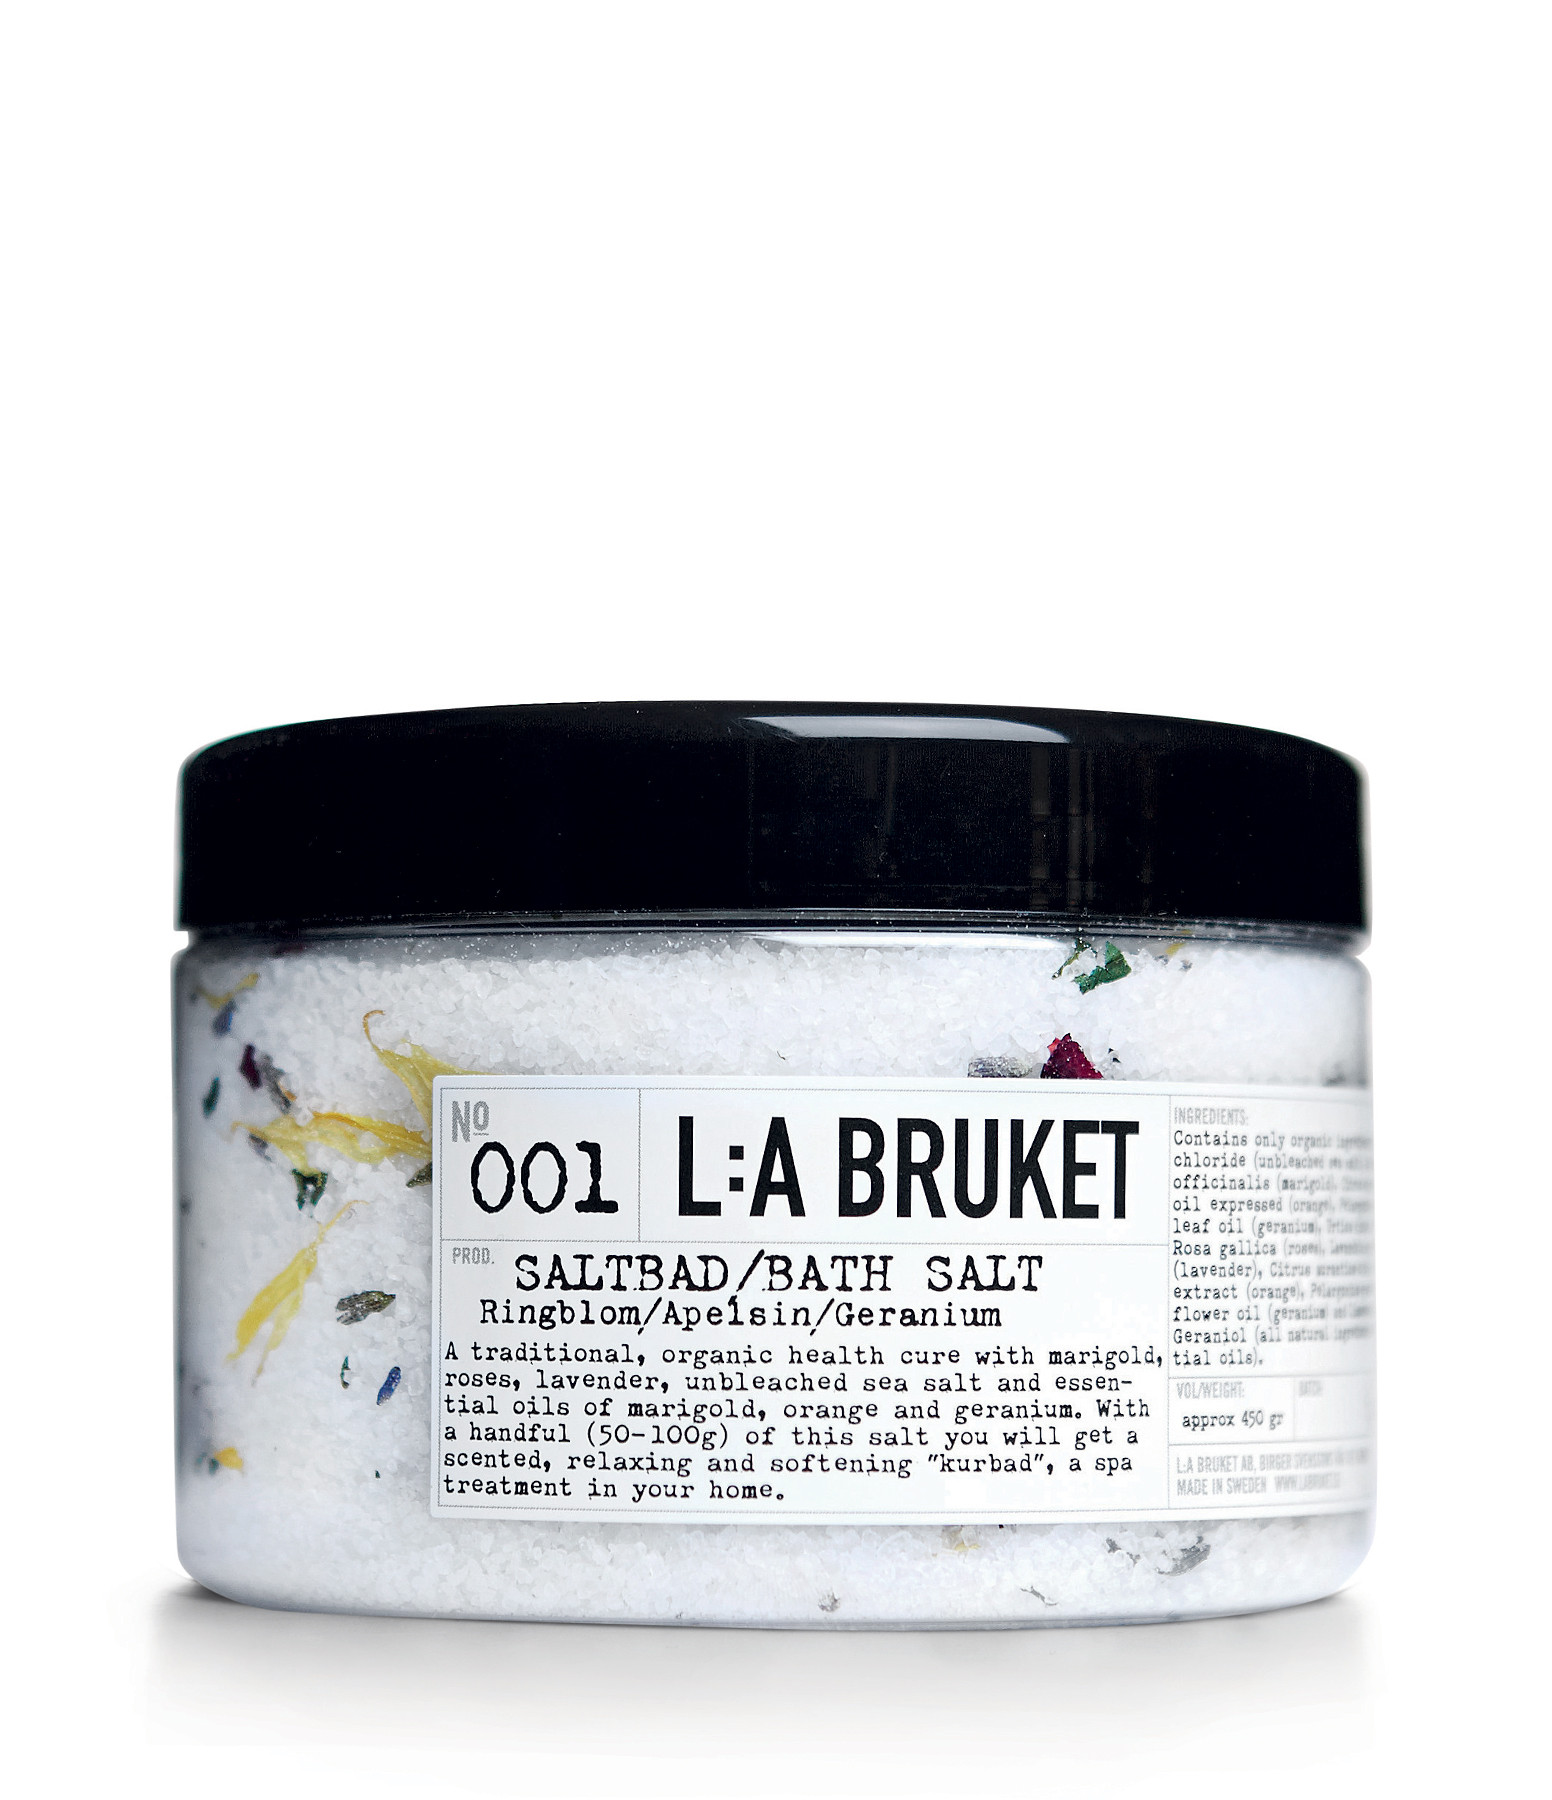 L:A BRUKET - Sels de Bain Calendula Orange Geranium 450g N°001